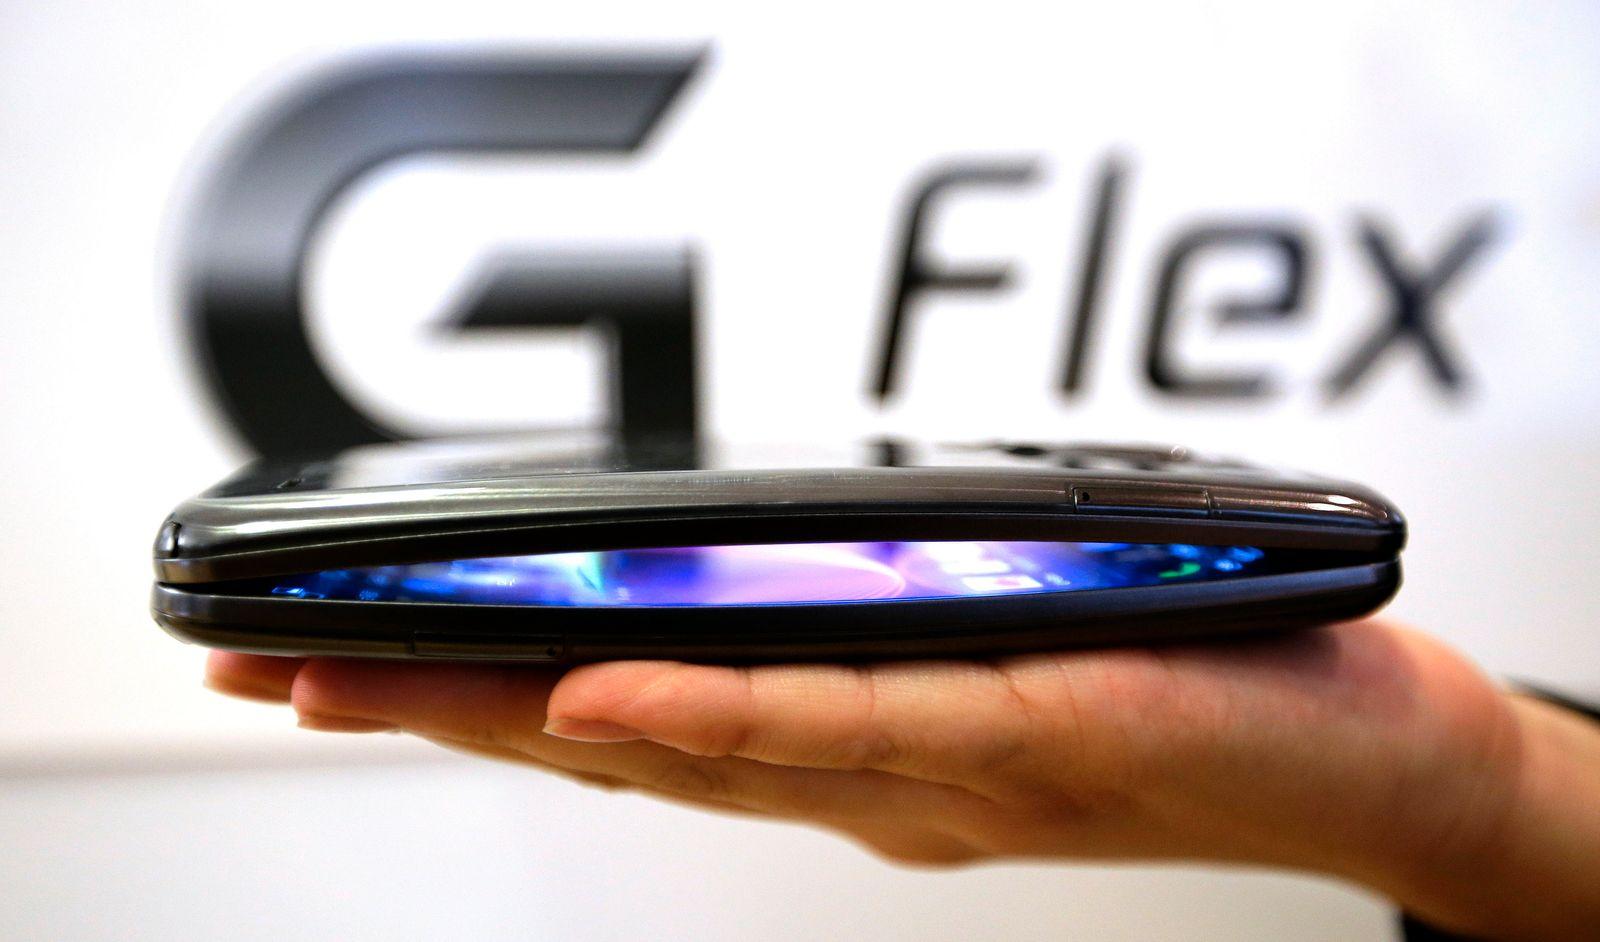 South Korea LG Curved Smartphone